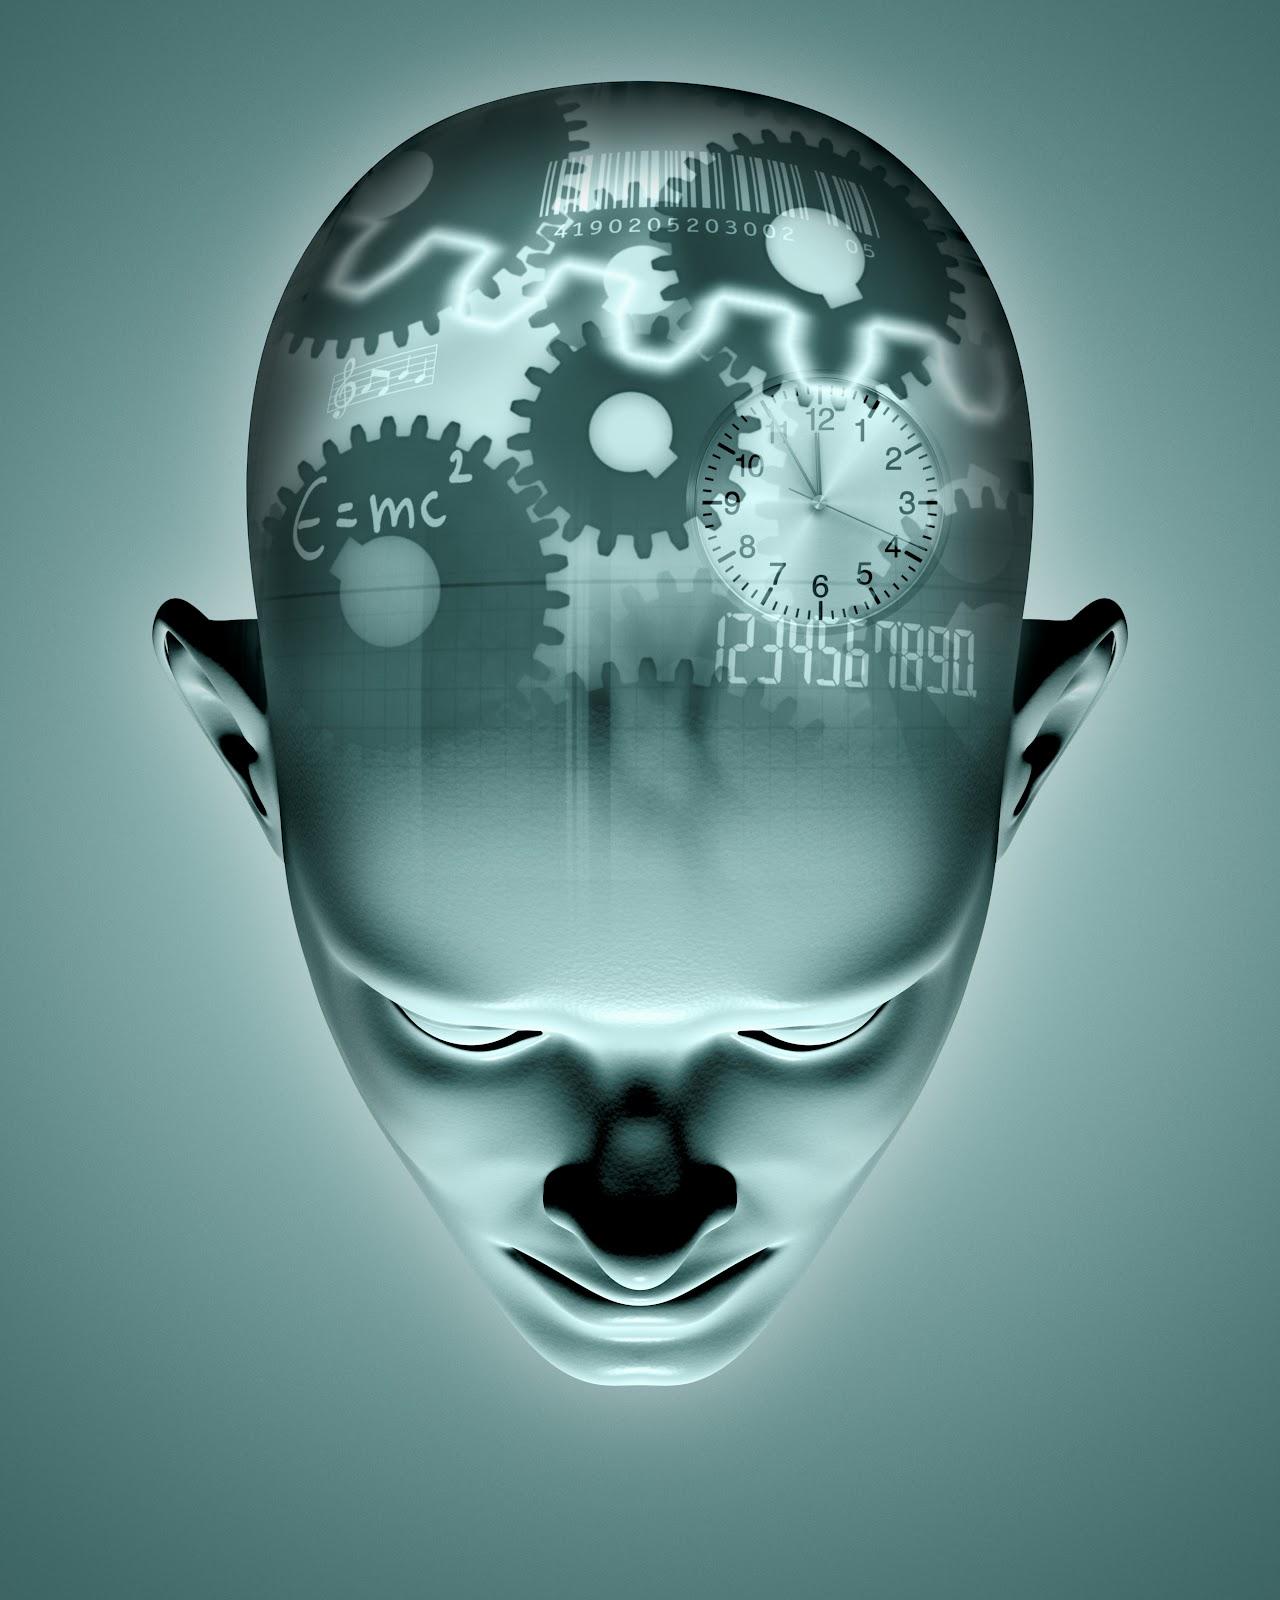 ... game wallpaper fauzi blog gambar otak manusia koleksi gambar kepala